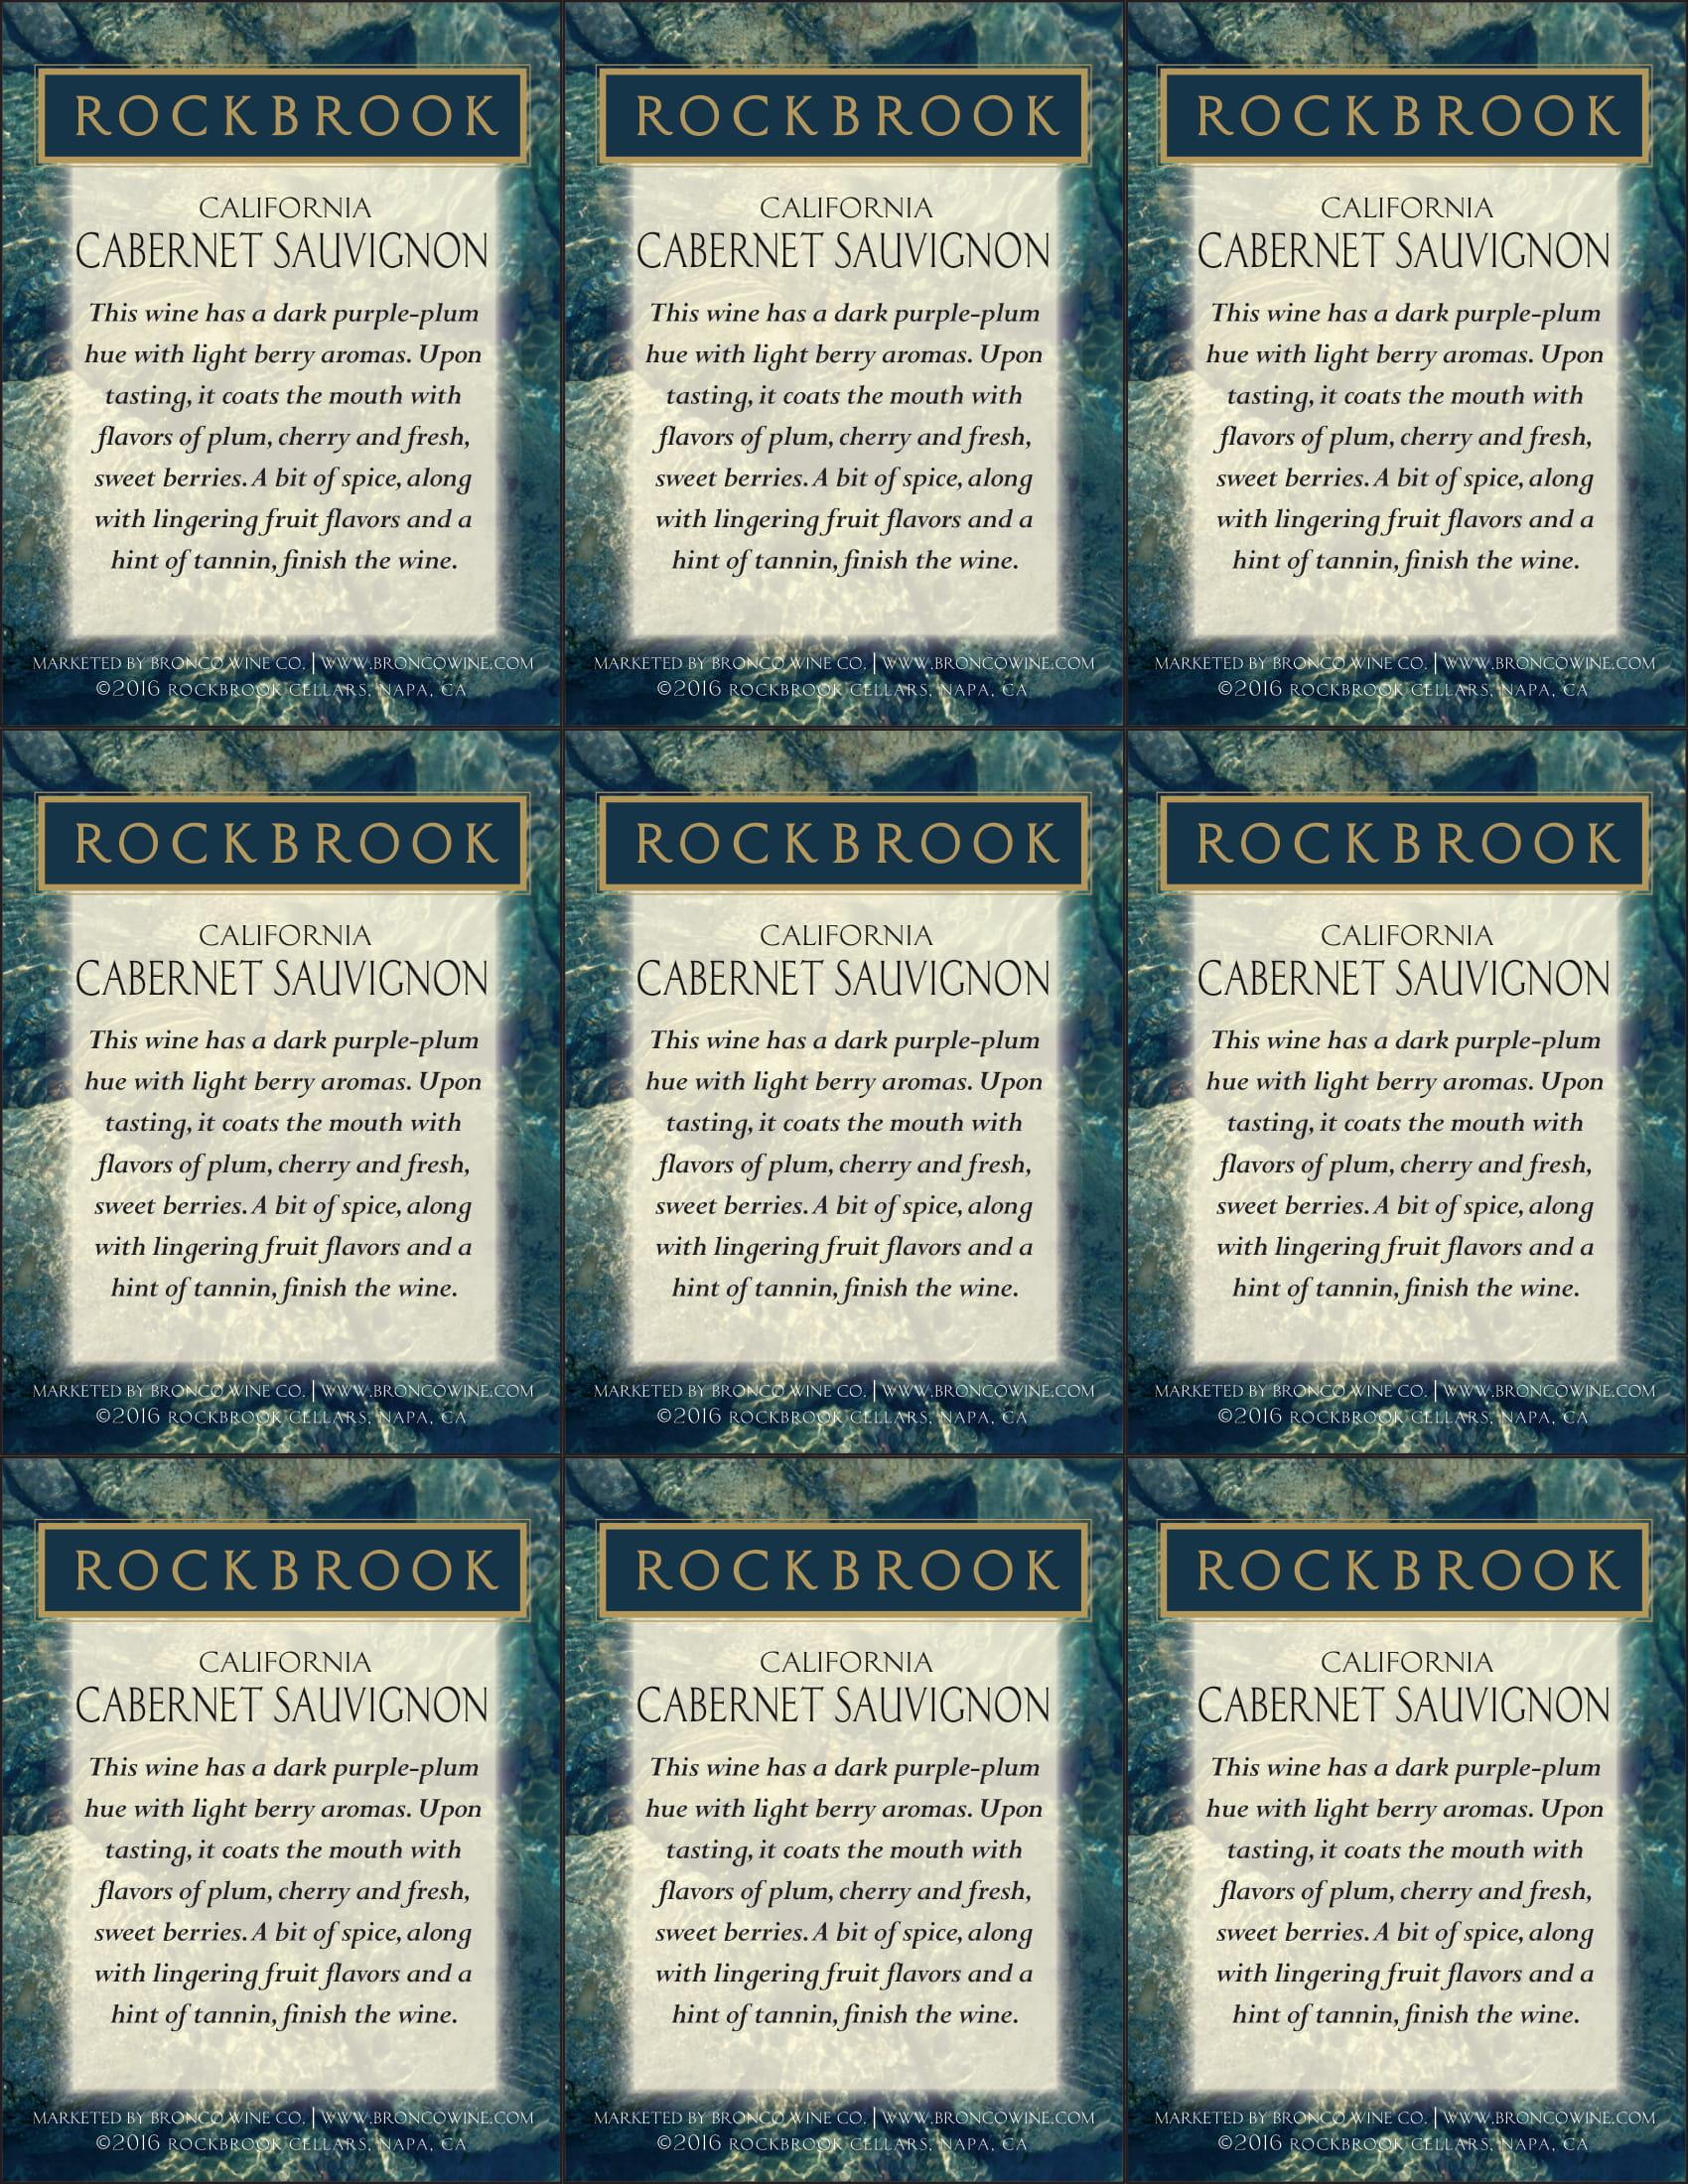 Rockbrook Cellars Cabernet Sauvignon Shelf Talkers